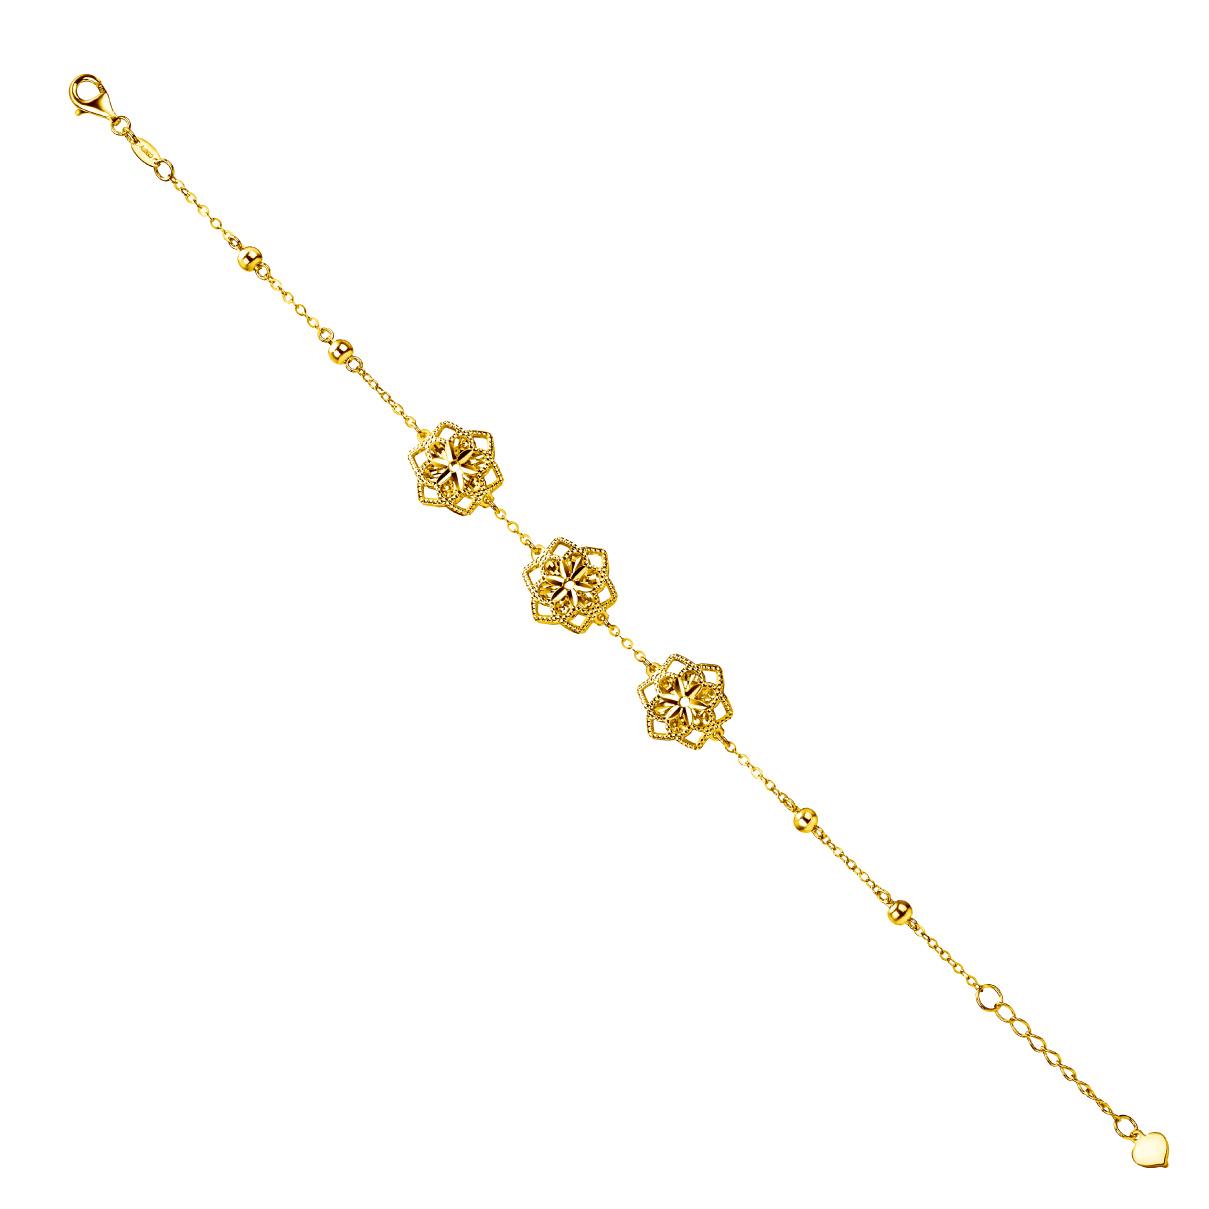 Goldstyle「繁星」手链